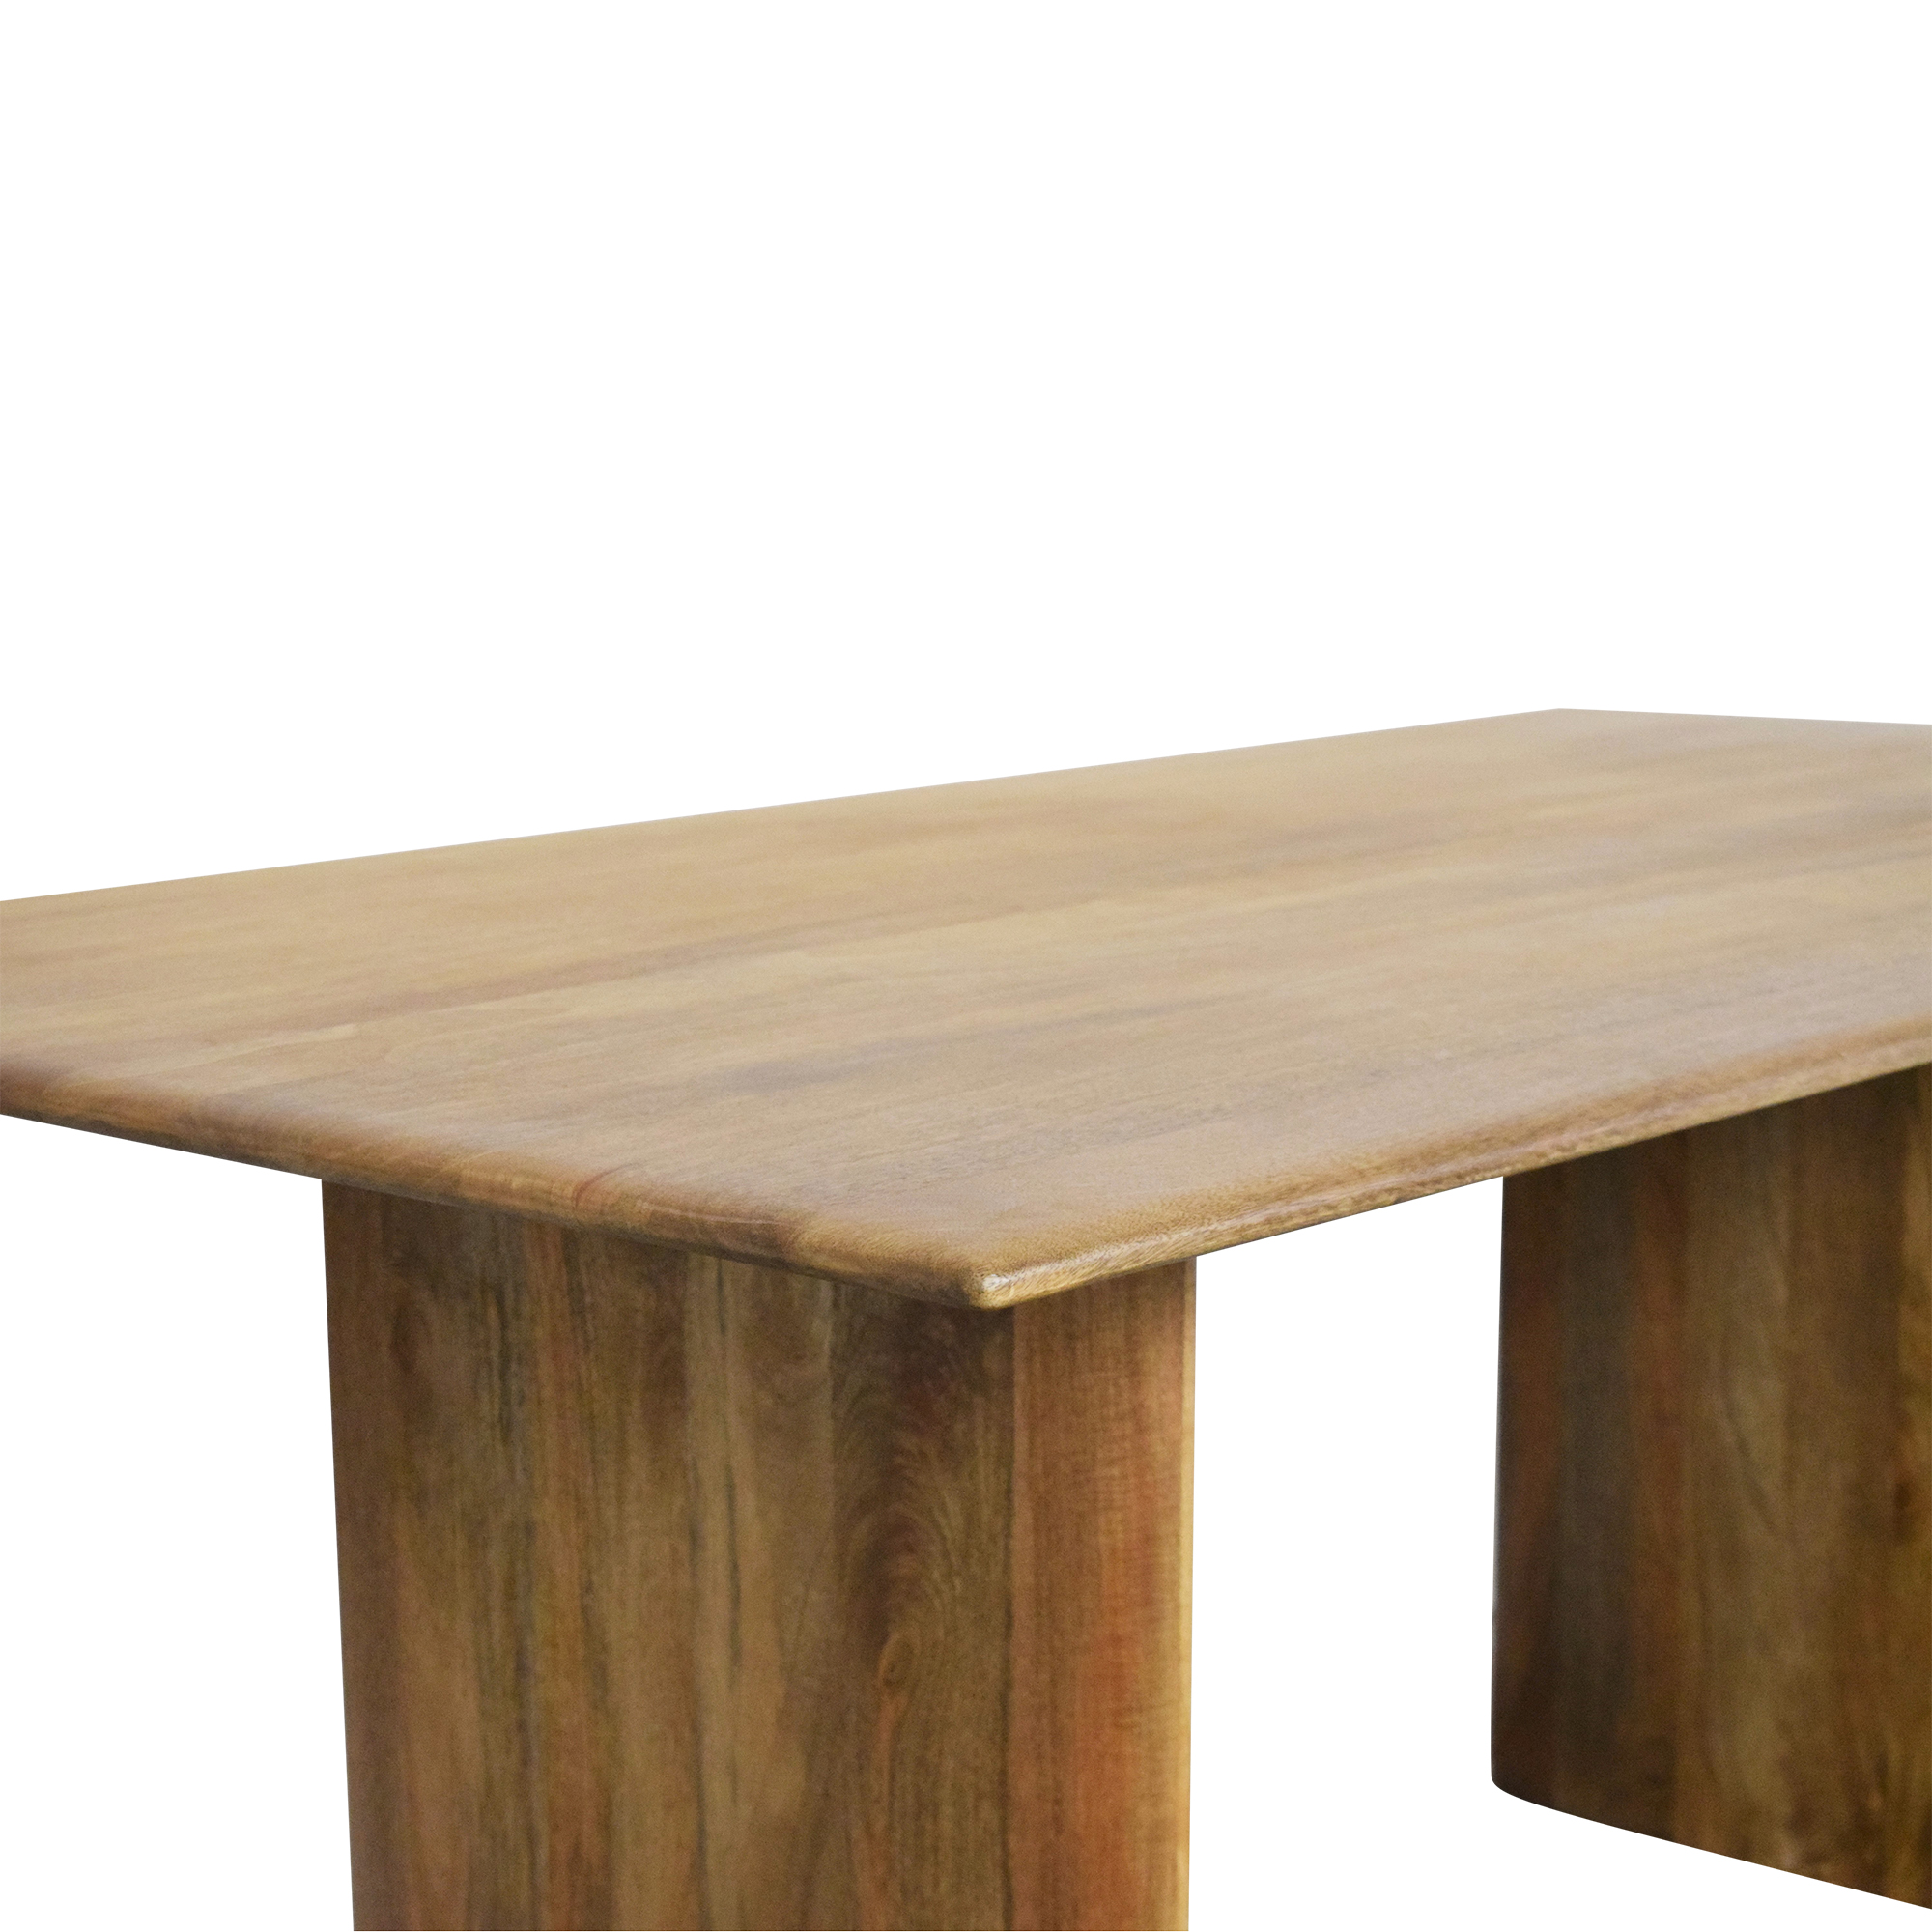 West Elm West Elm Anton Dining Table used